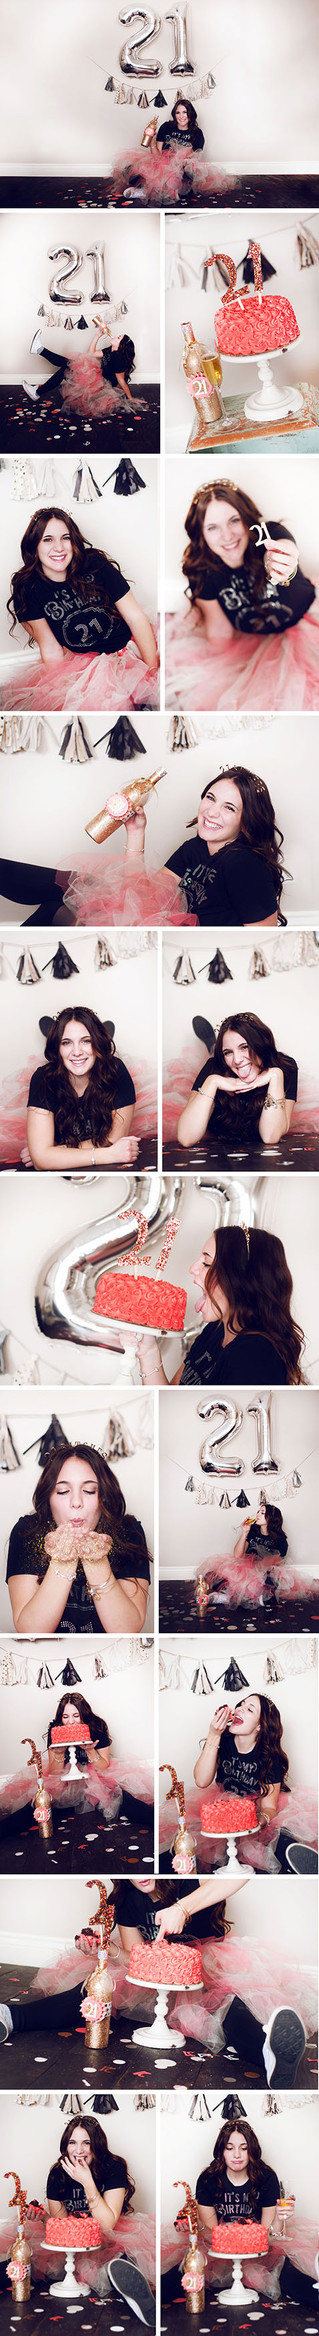 Haylee is 21!